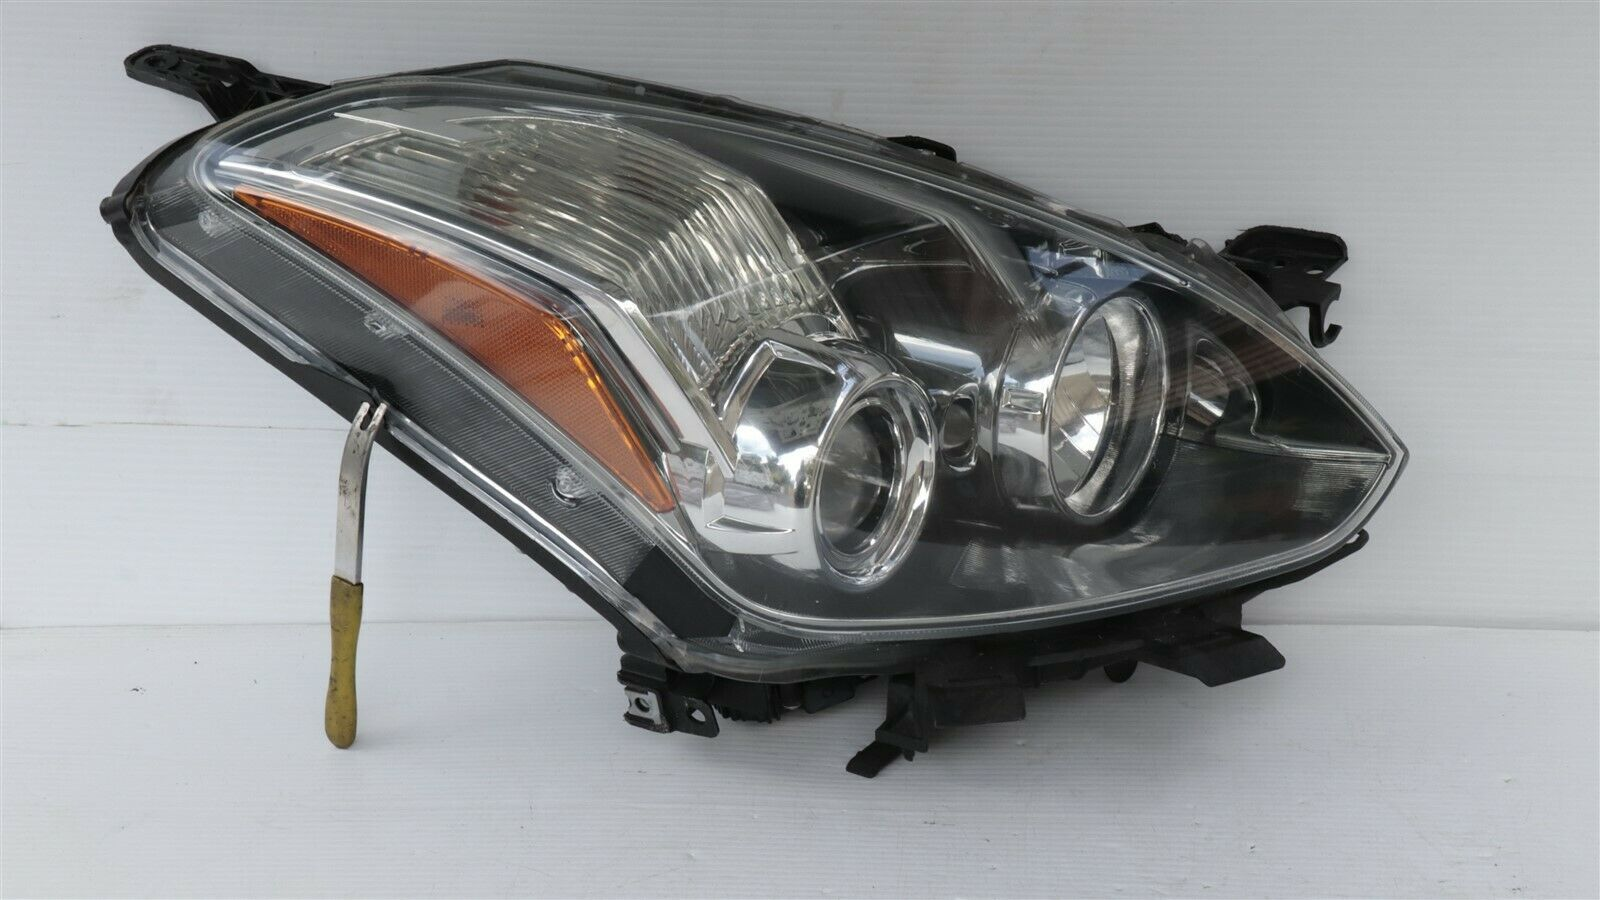 10-12 Nissan Altima Coupe HID Xenon Headlight Lamp Passenger Right RH - POLISHED